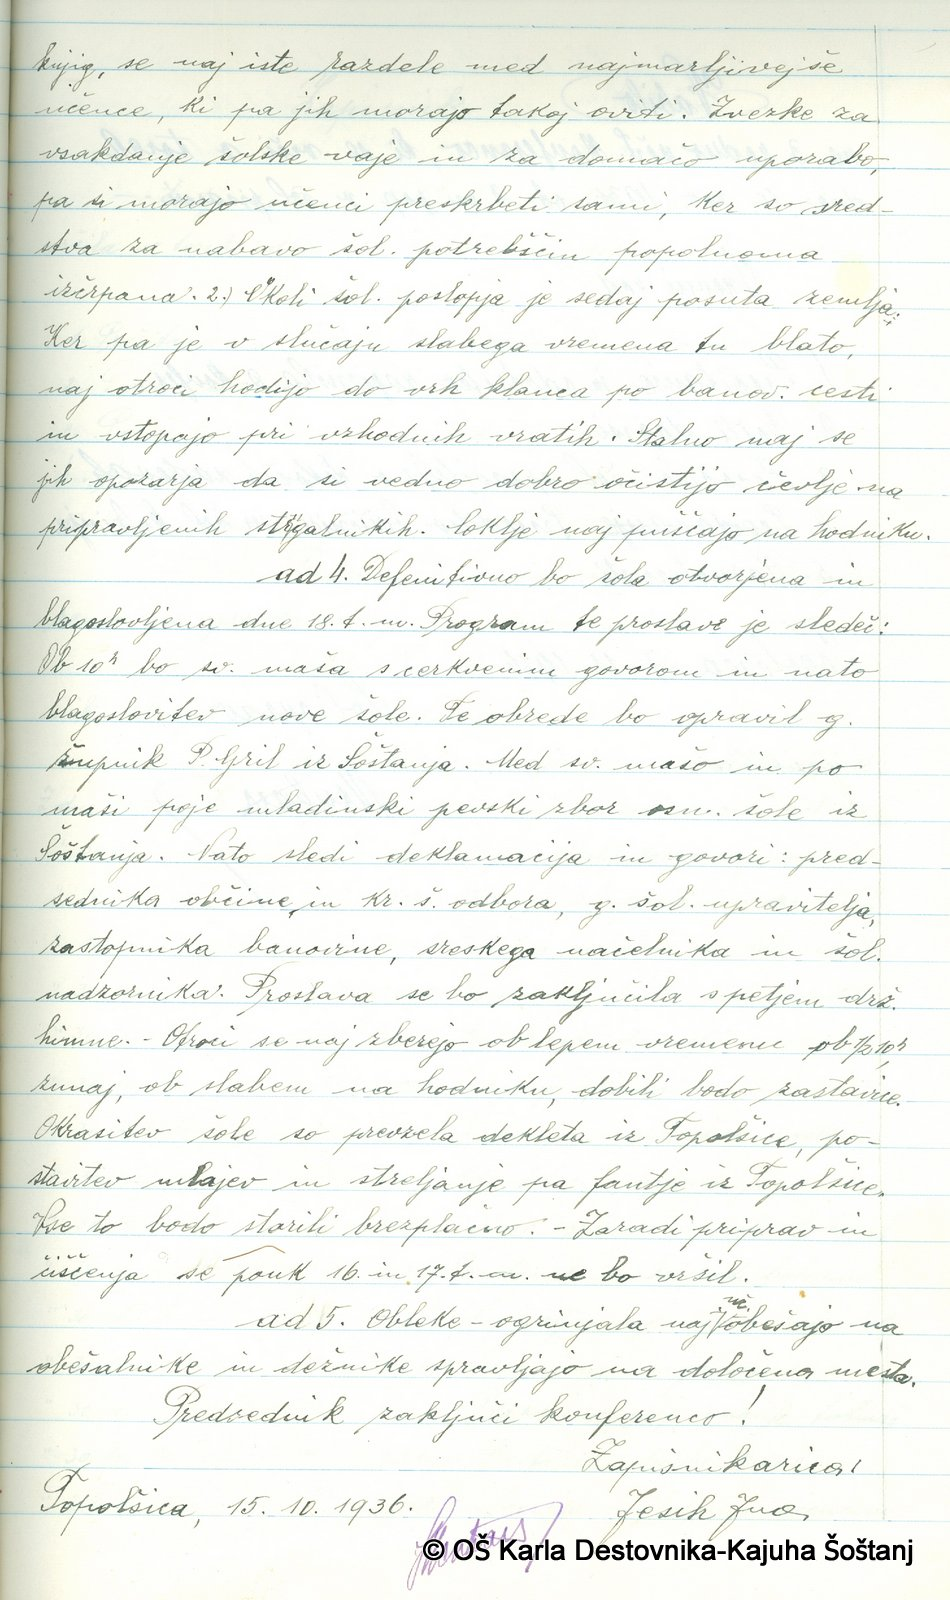 2konfzapisnik2_15_10_1936